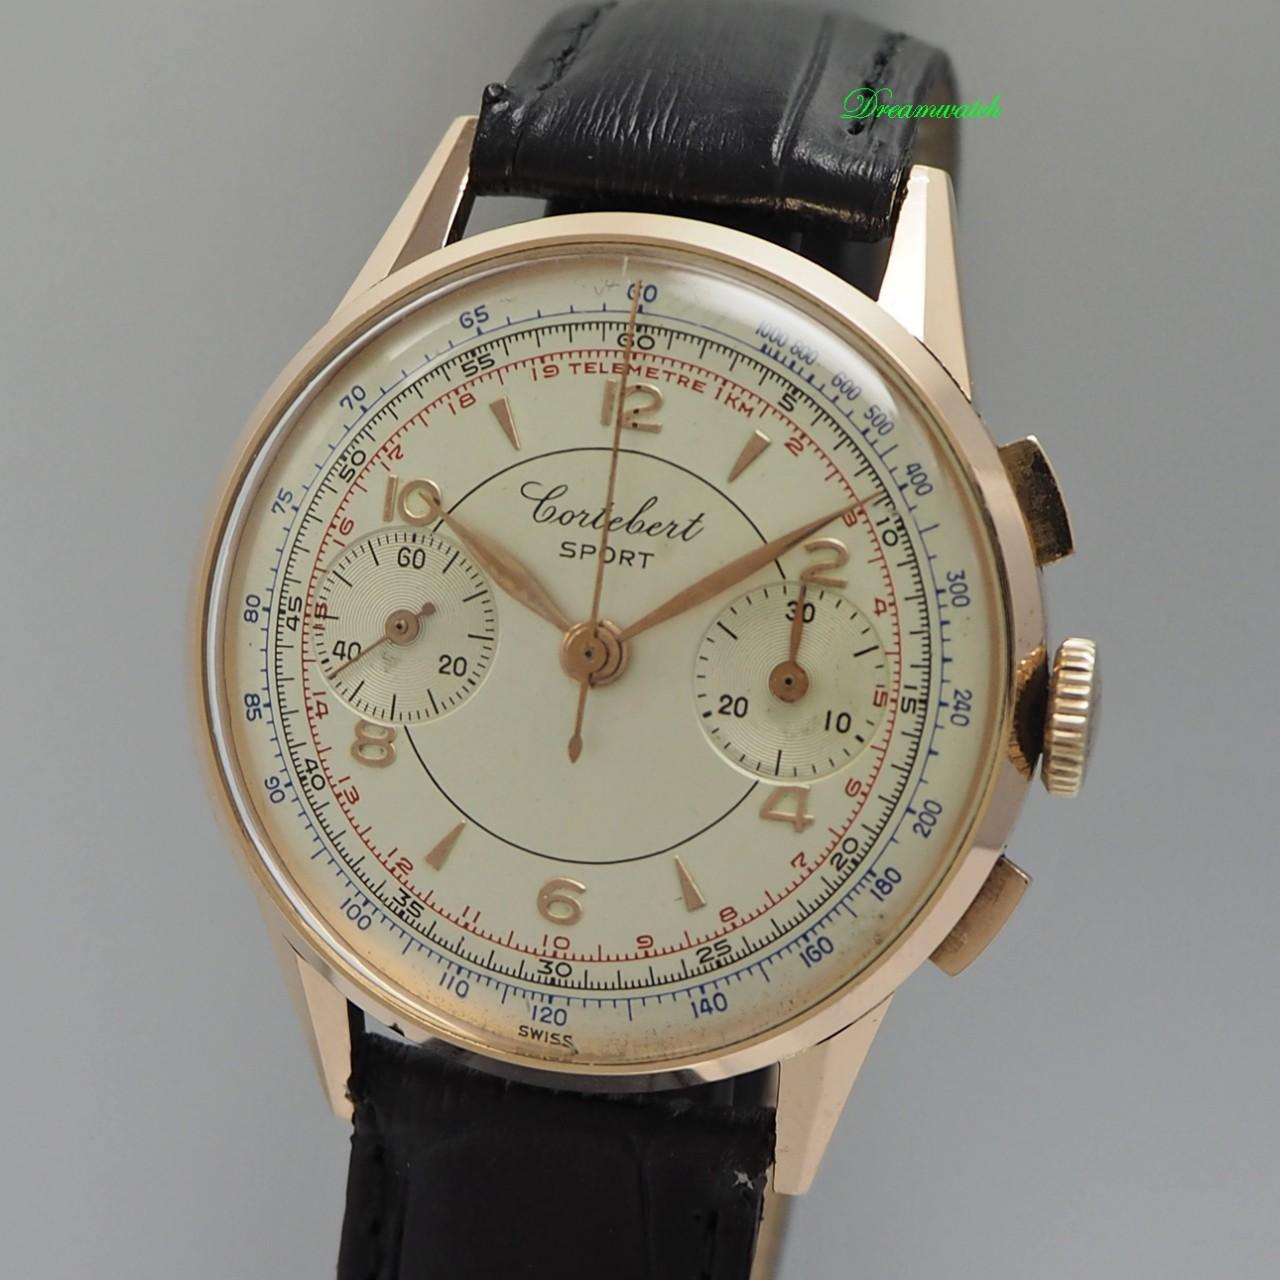 Cortebert Sport Chronograph Vintage -Gold 18k/750